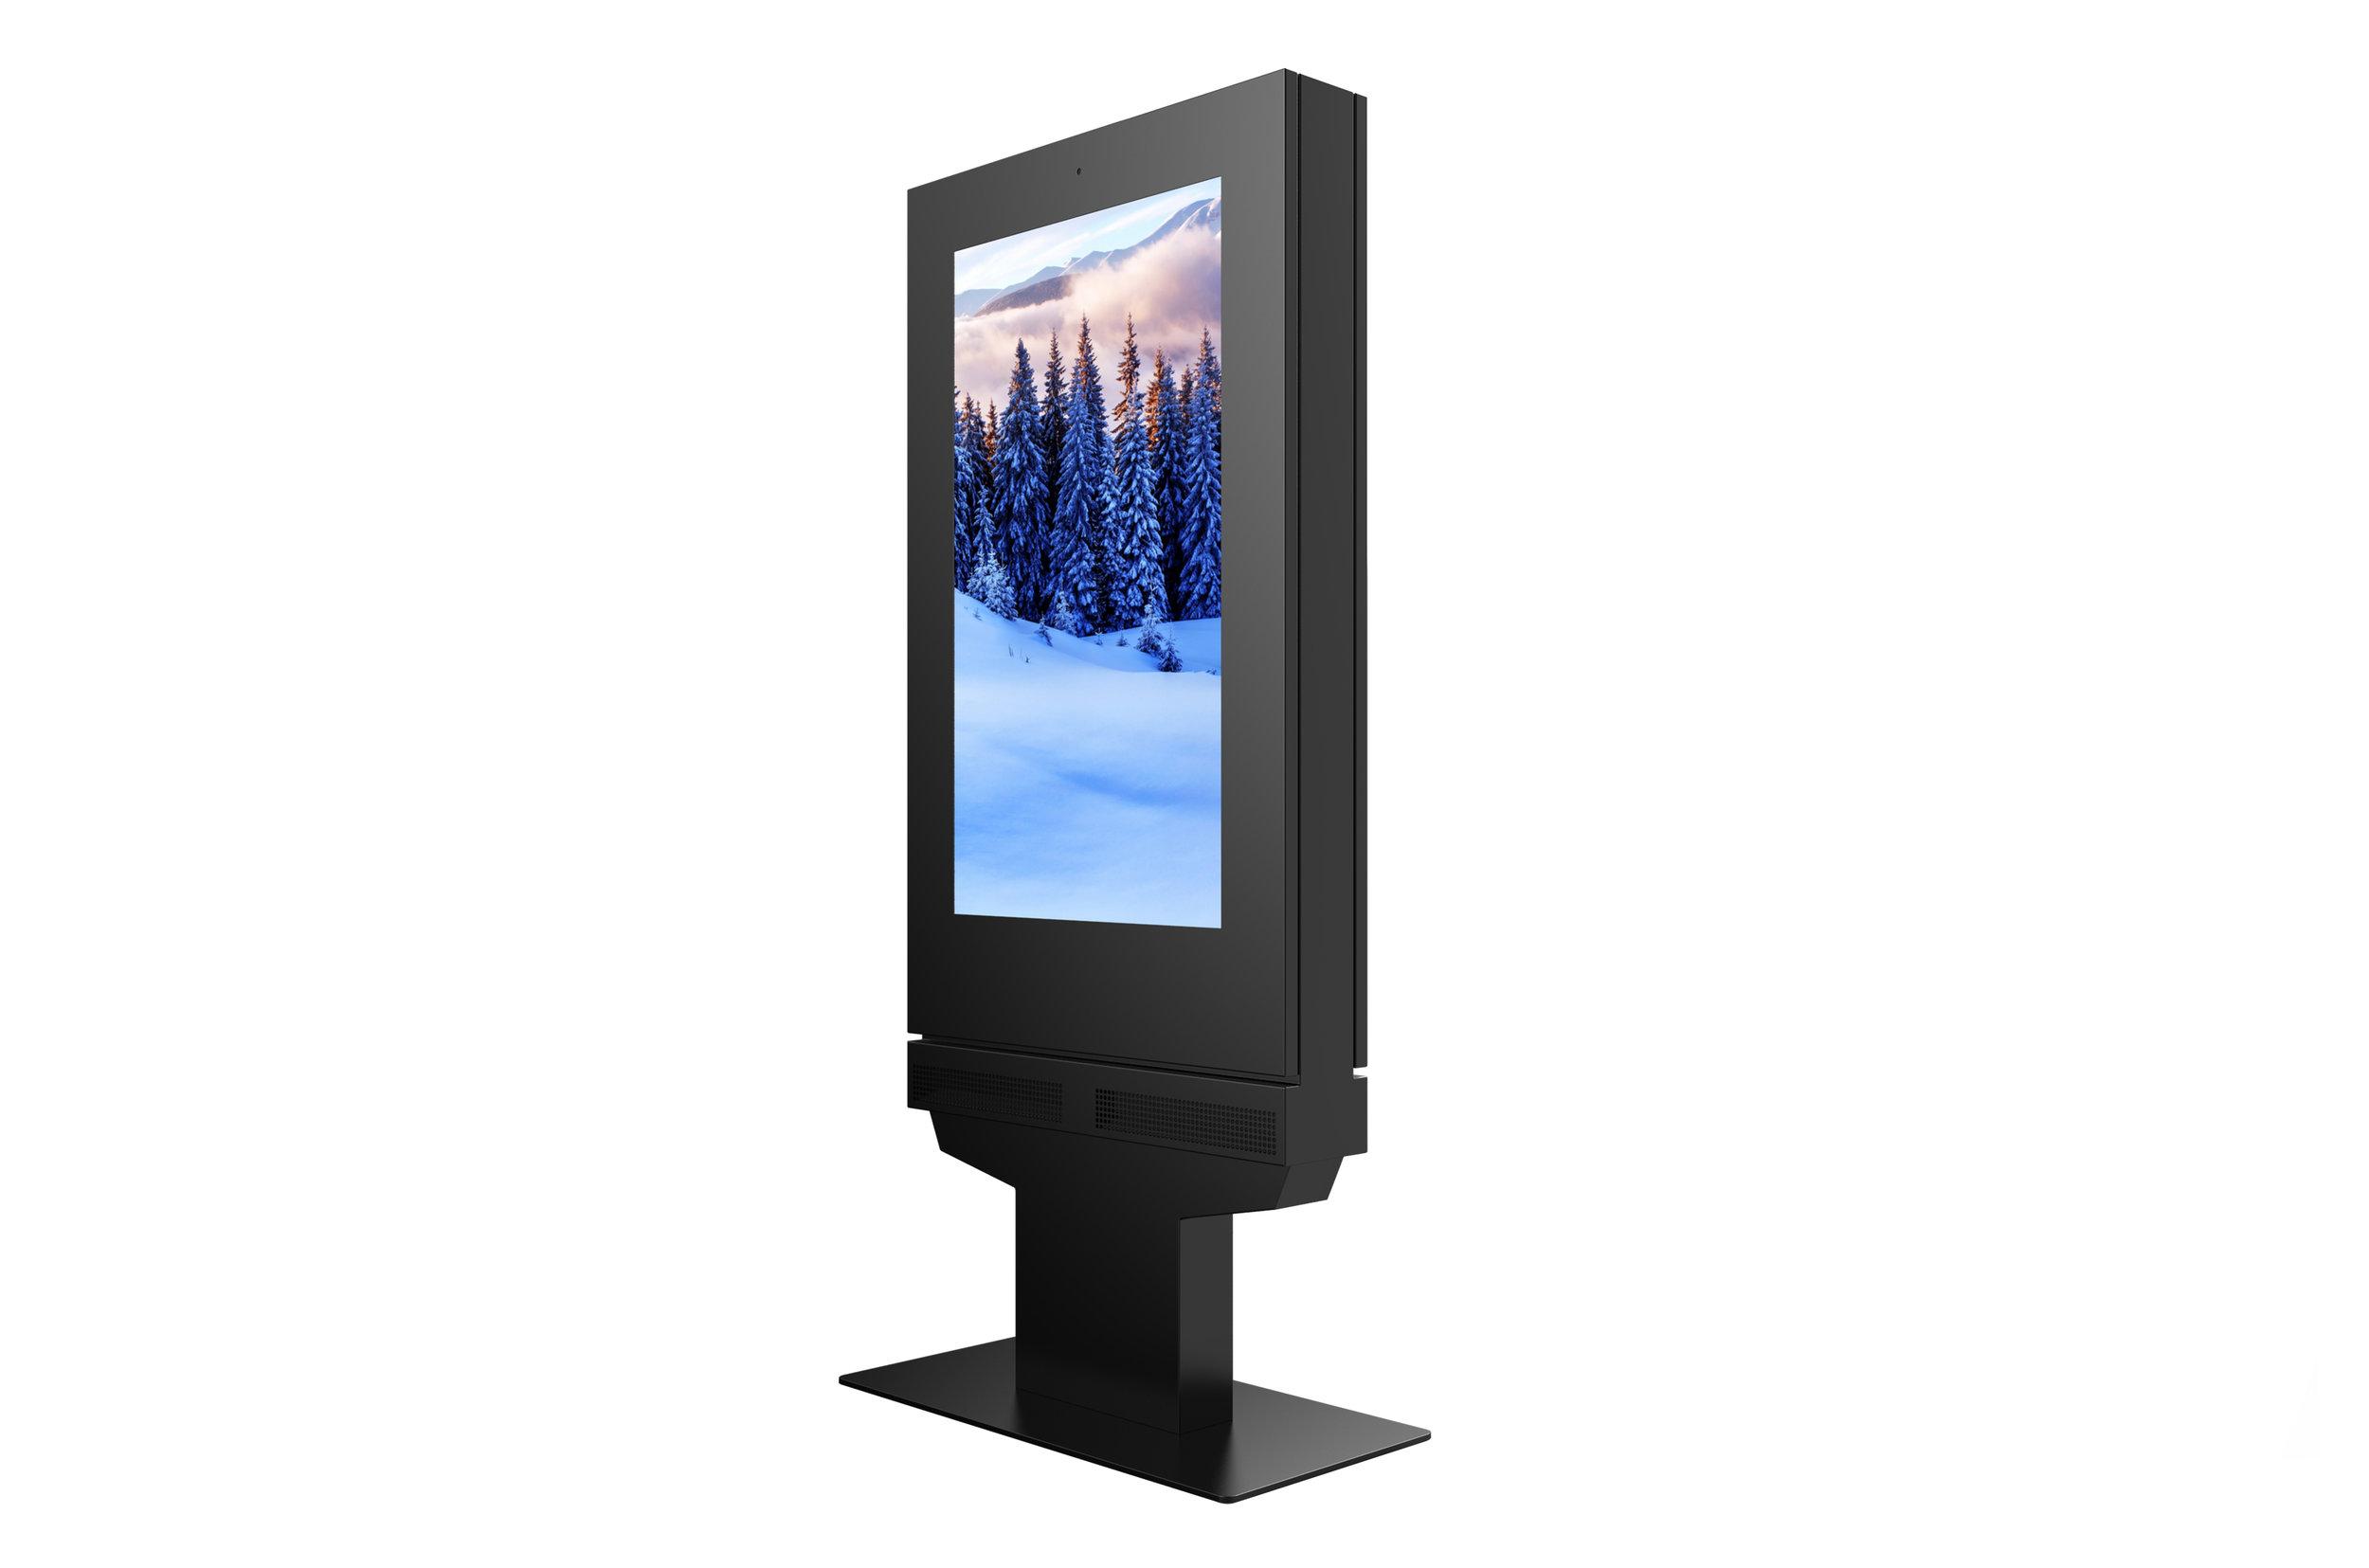 Keewin display 5565437075 outdoor high brightness Displsy-2.jpg